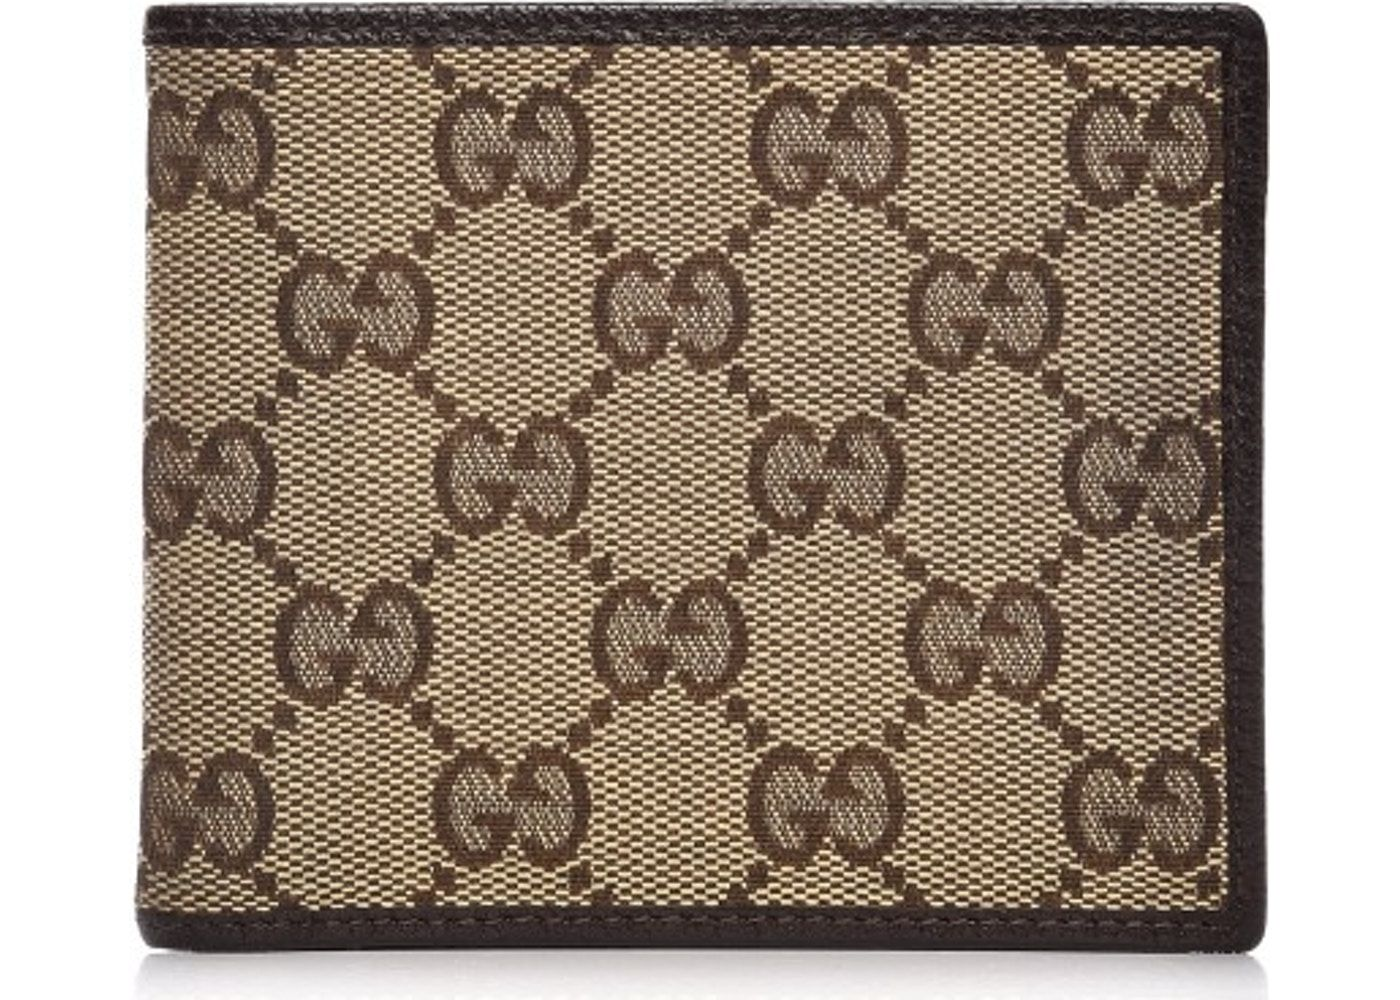 ed4478ddbae7 Gucci Mens Bifold Wallet Monogram GG Brown/Beige | Style Wish List ...